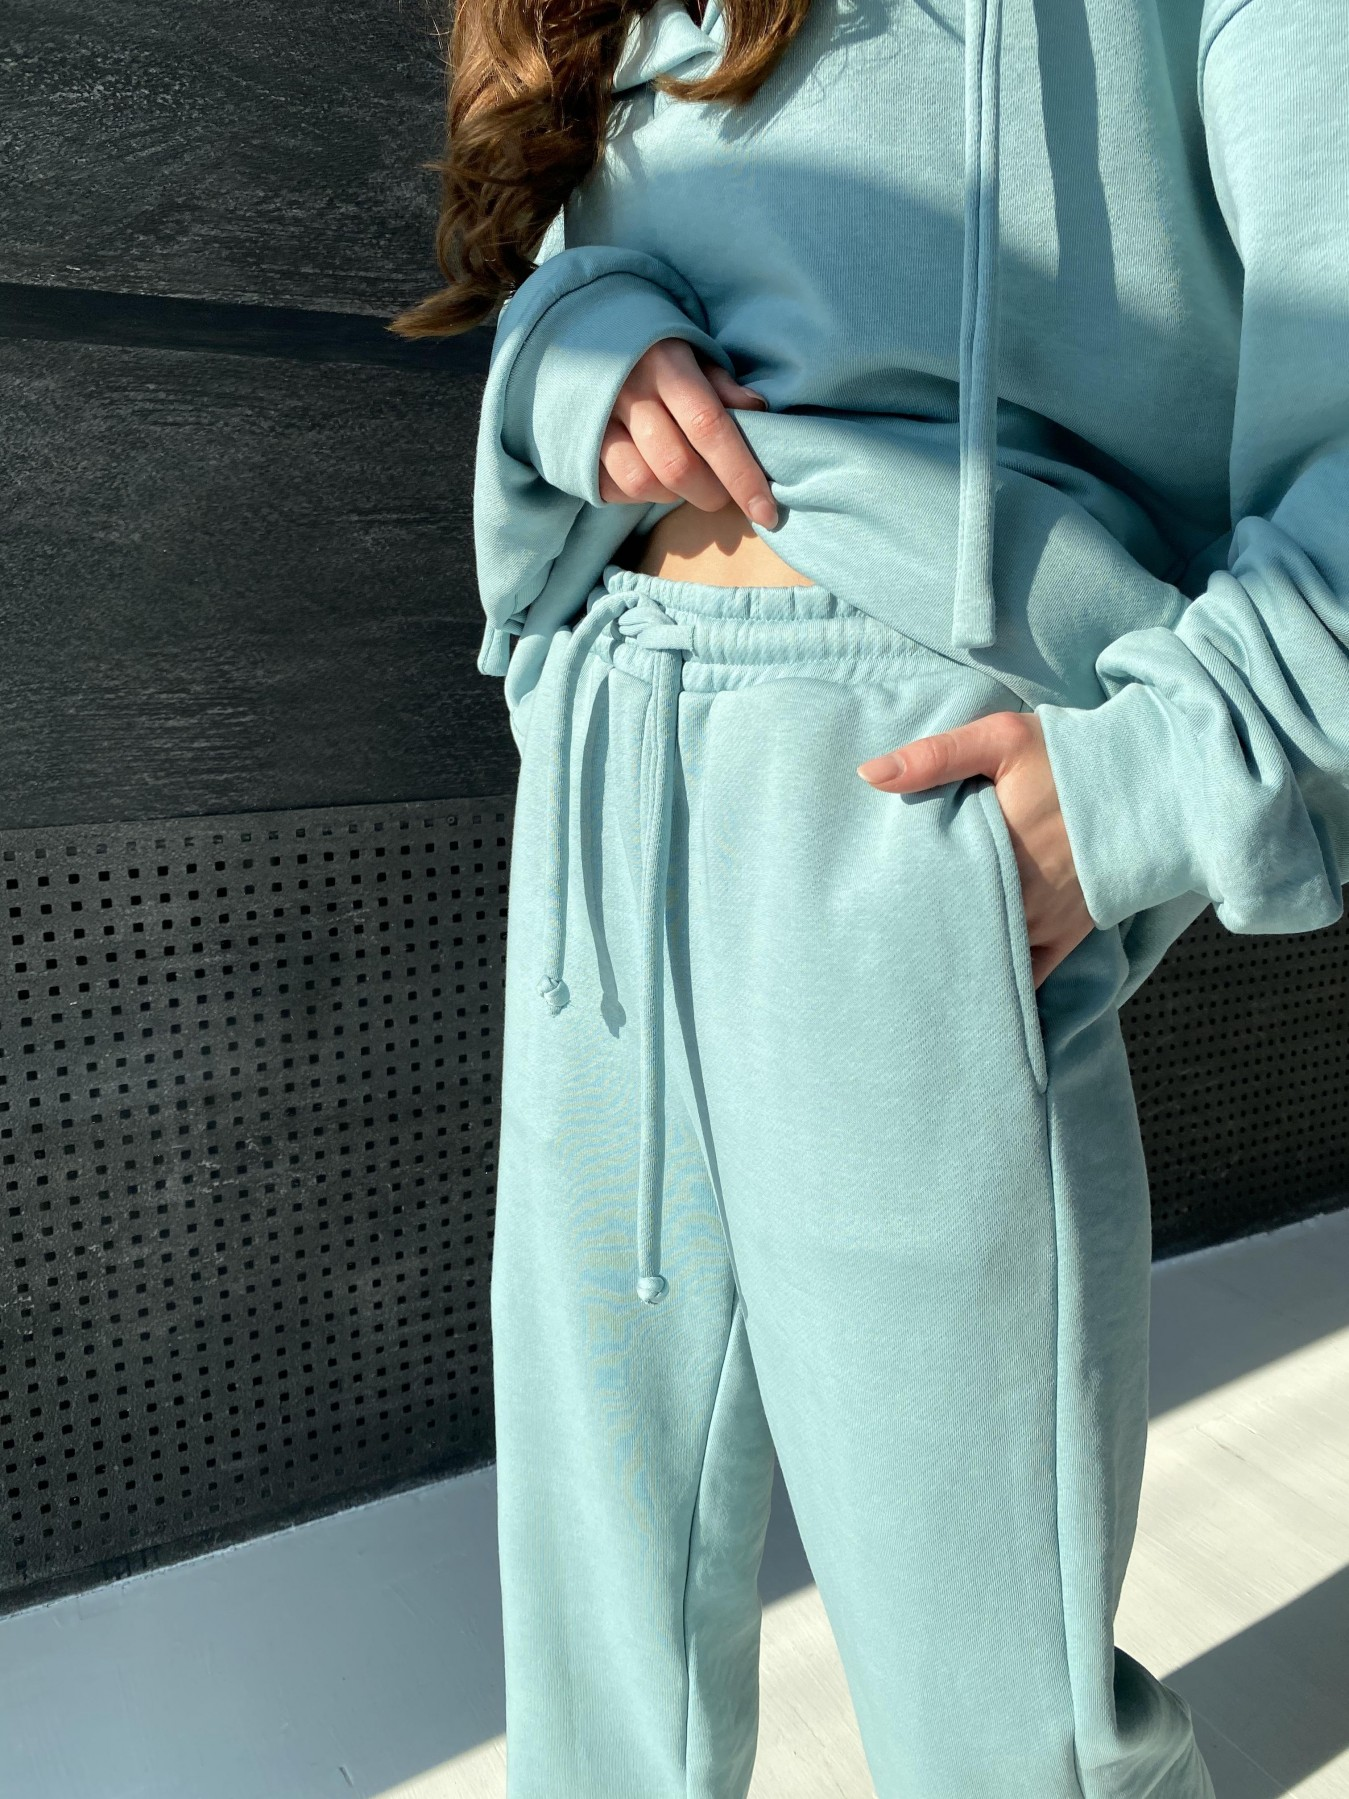 Ярис костюм из 3х нитки 10789 АРТ. 47264 Цвет: Олива - фото 4, интернет магазин tm-modus.ru